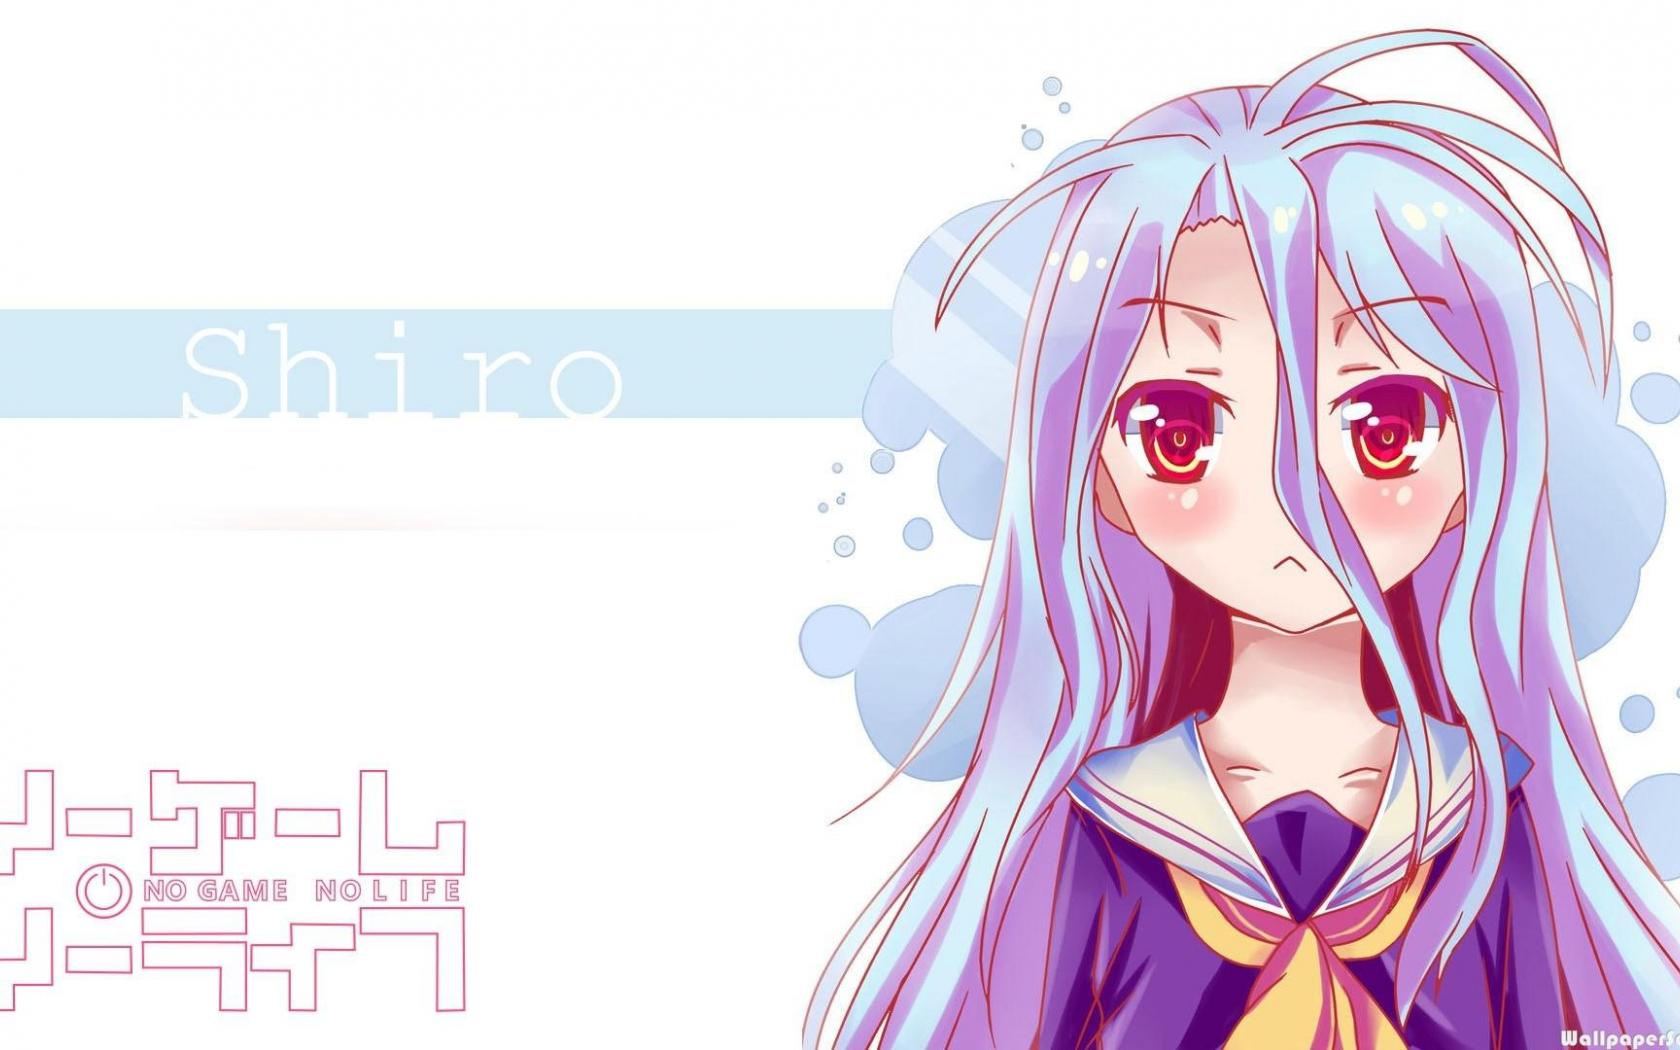 Free Download Hd Cute Girl Shiro No Game No Life Wallpaper